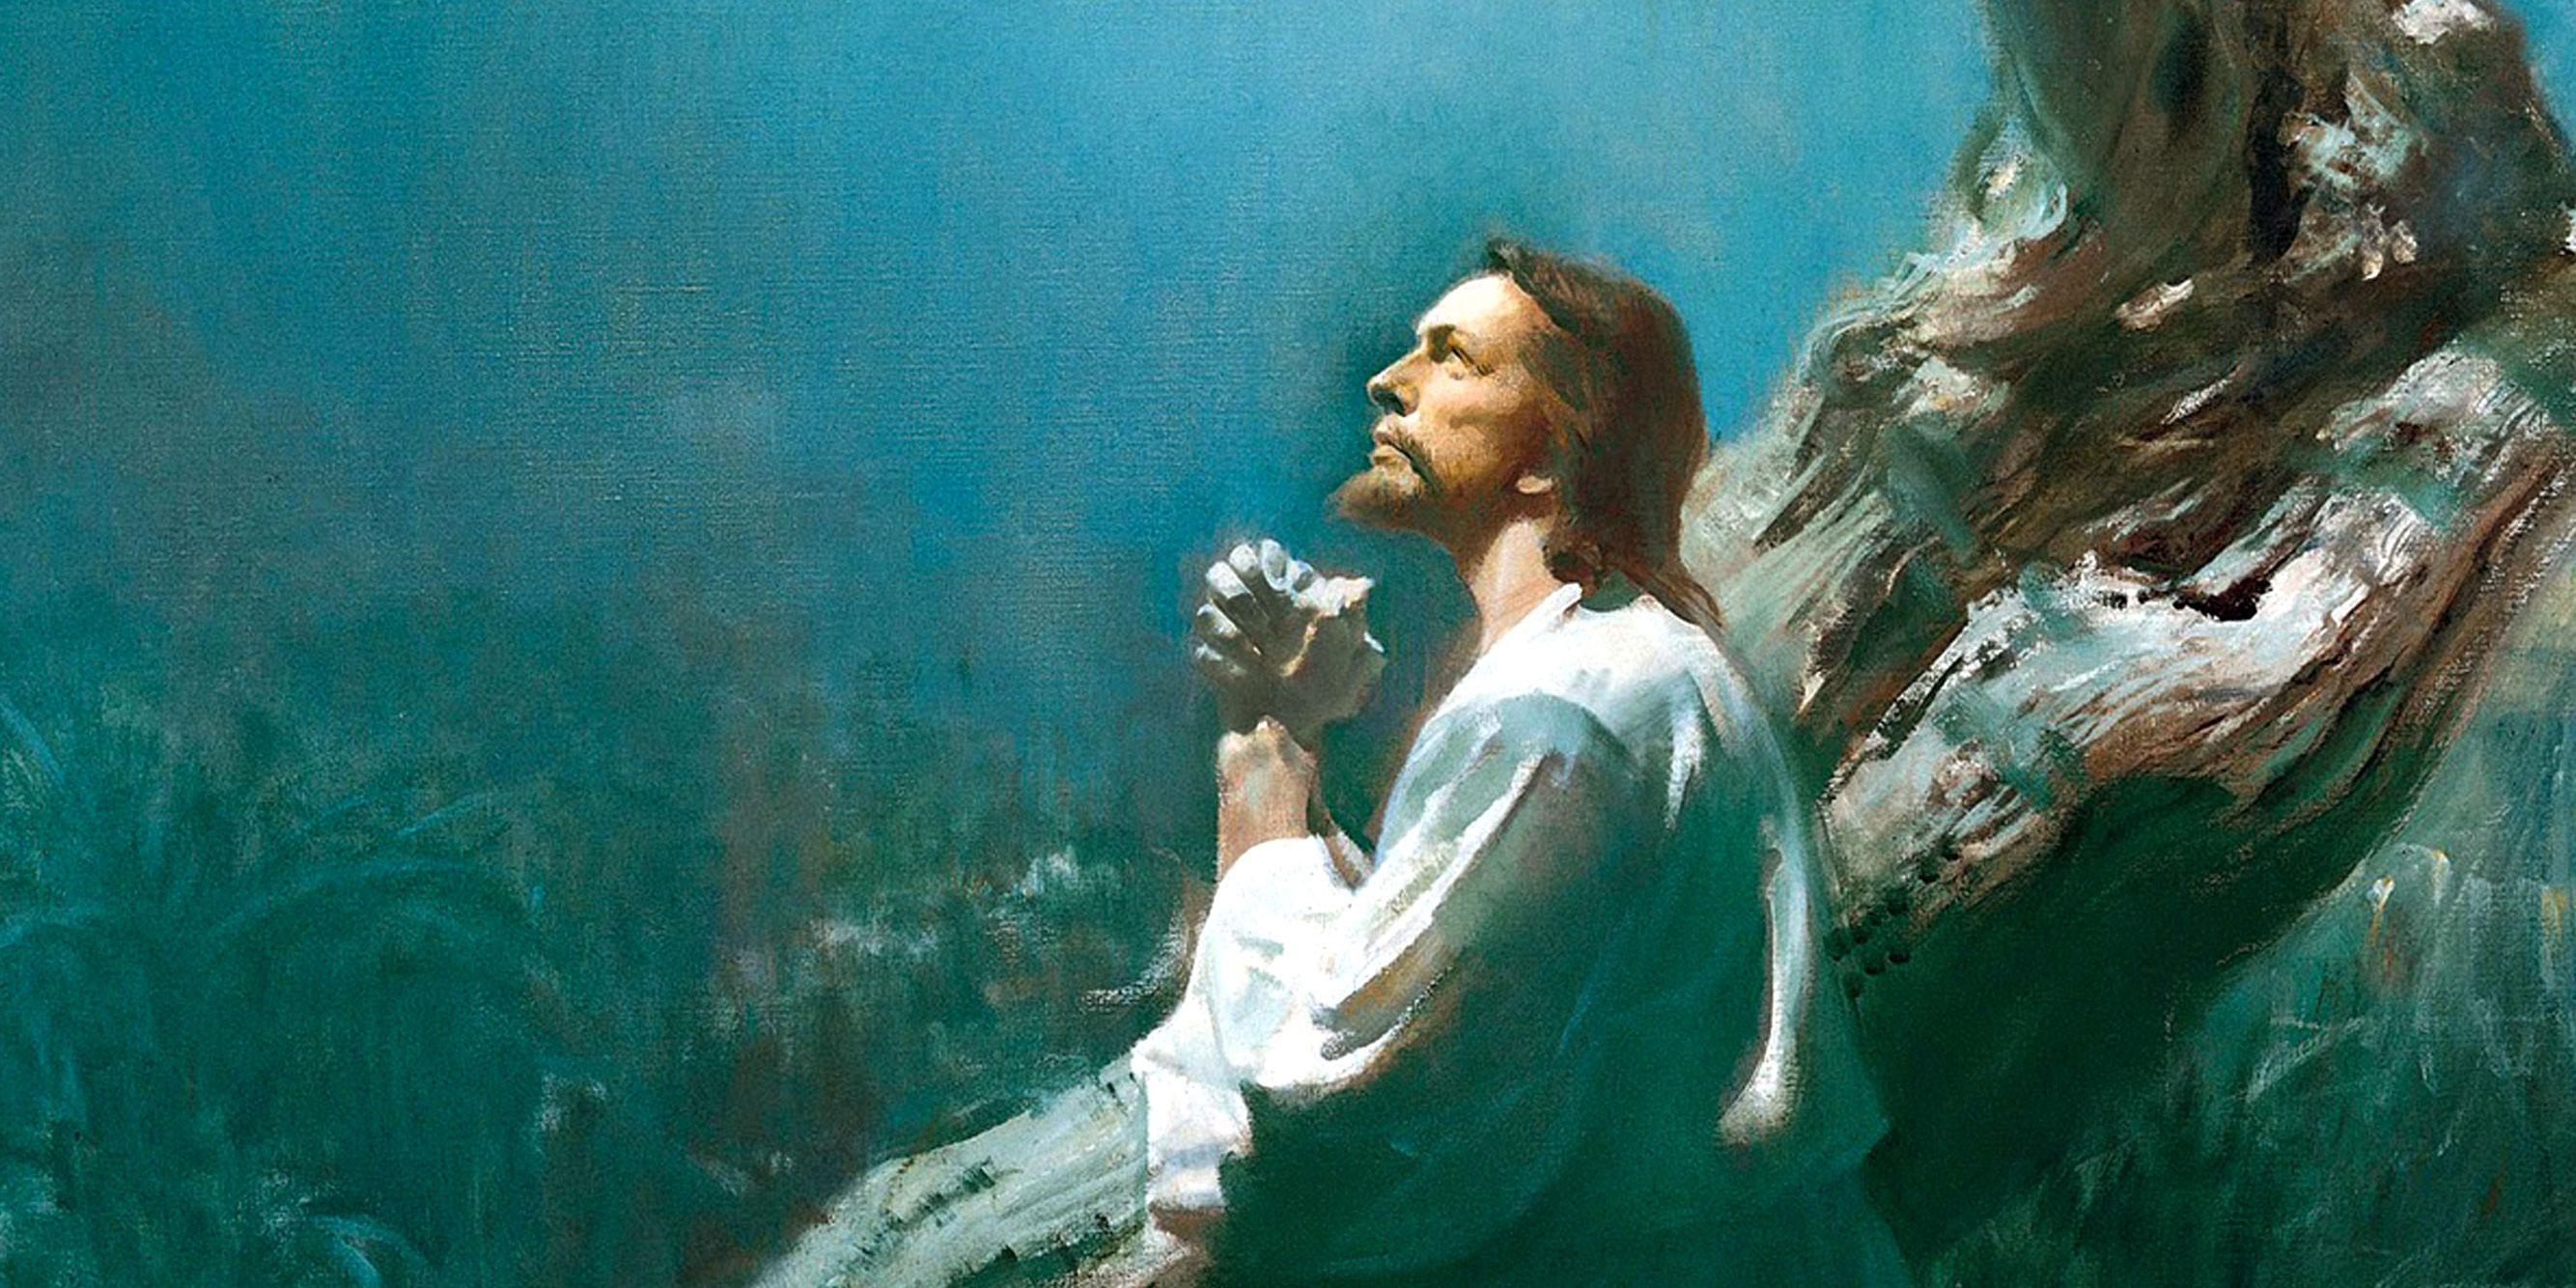 Christ in Gethsemane by Harry Anderson